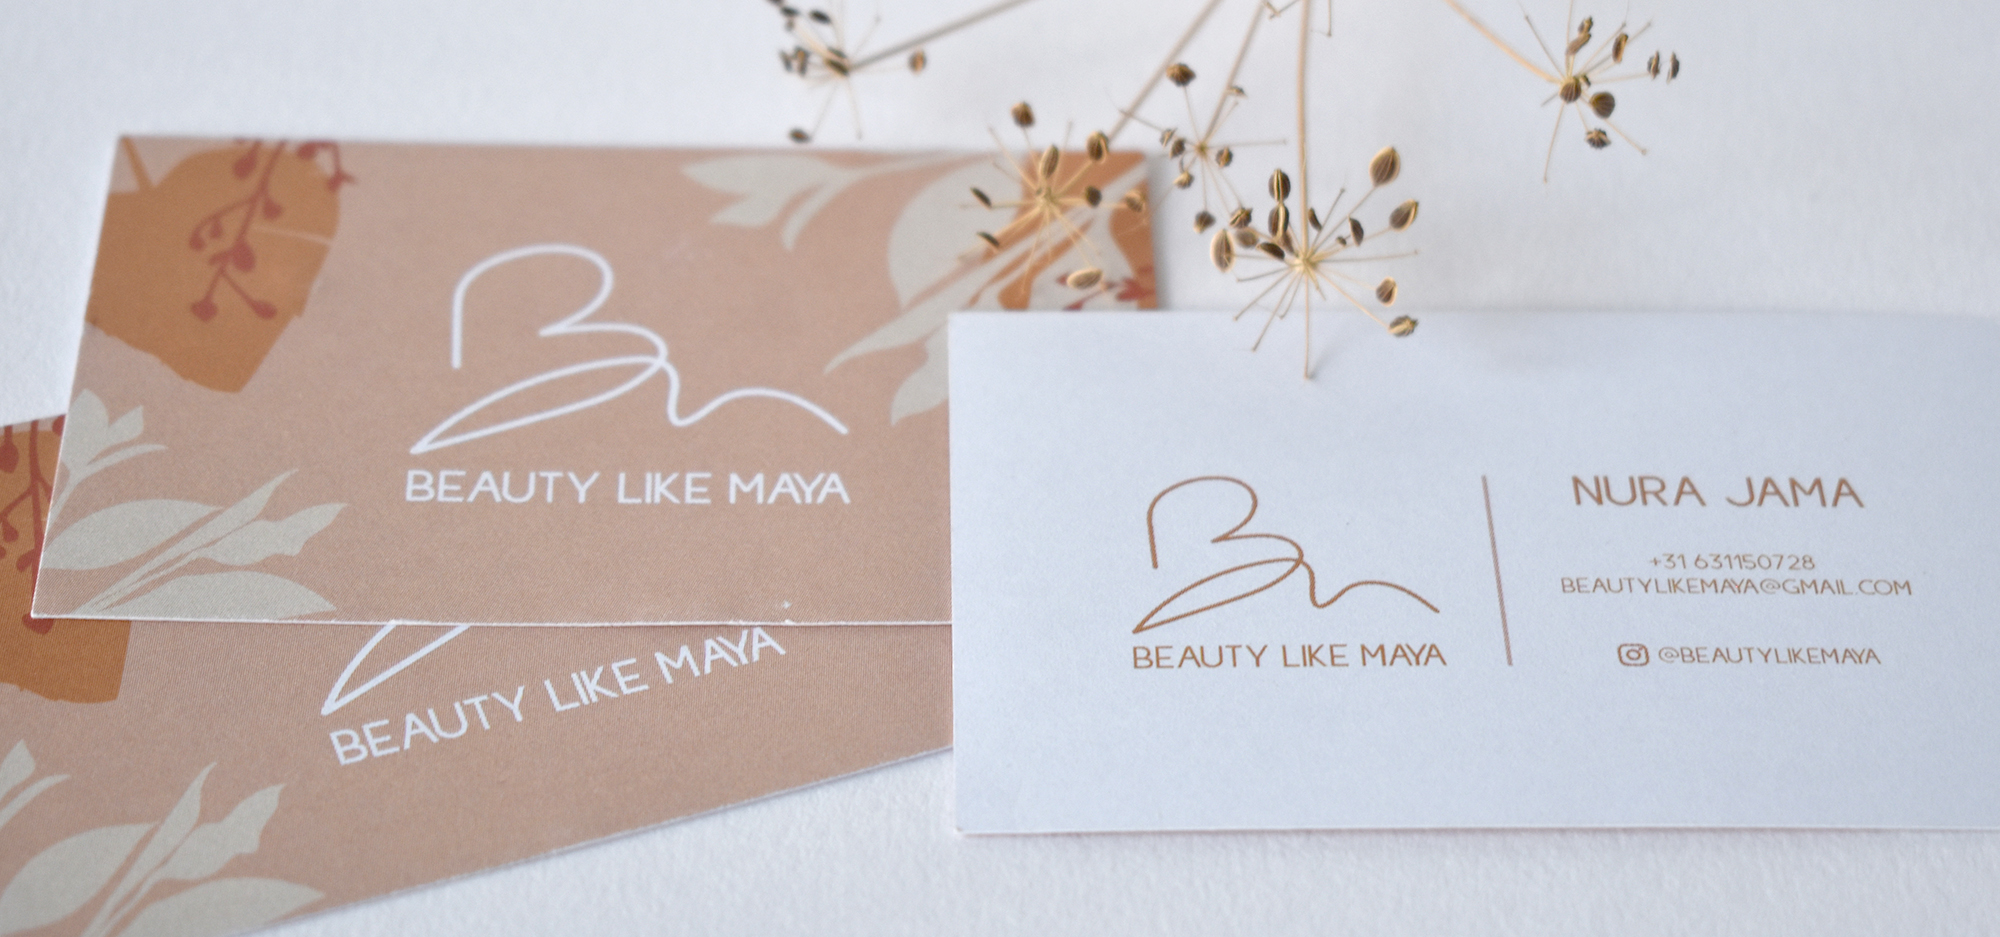 Branding Beauty like Maya 09 - studio katipeifer